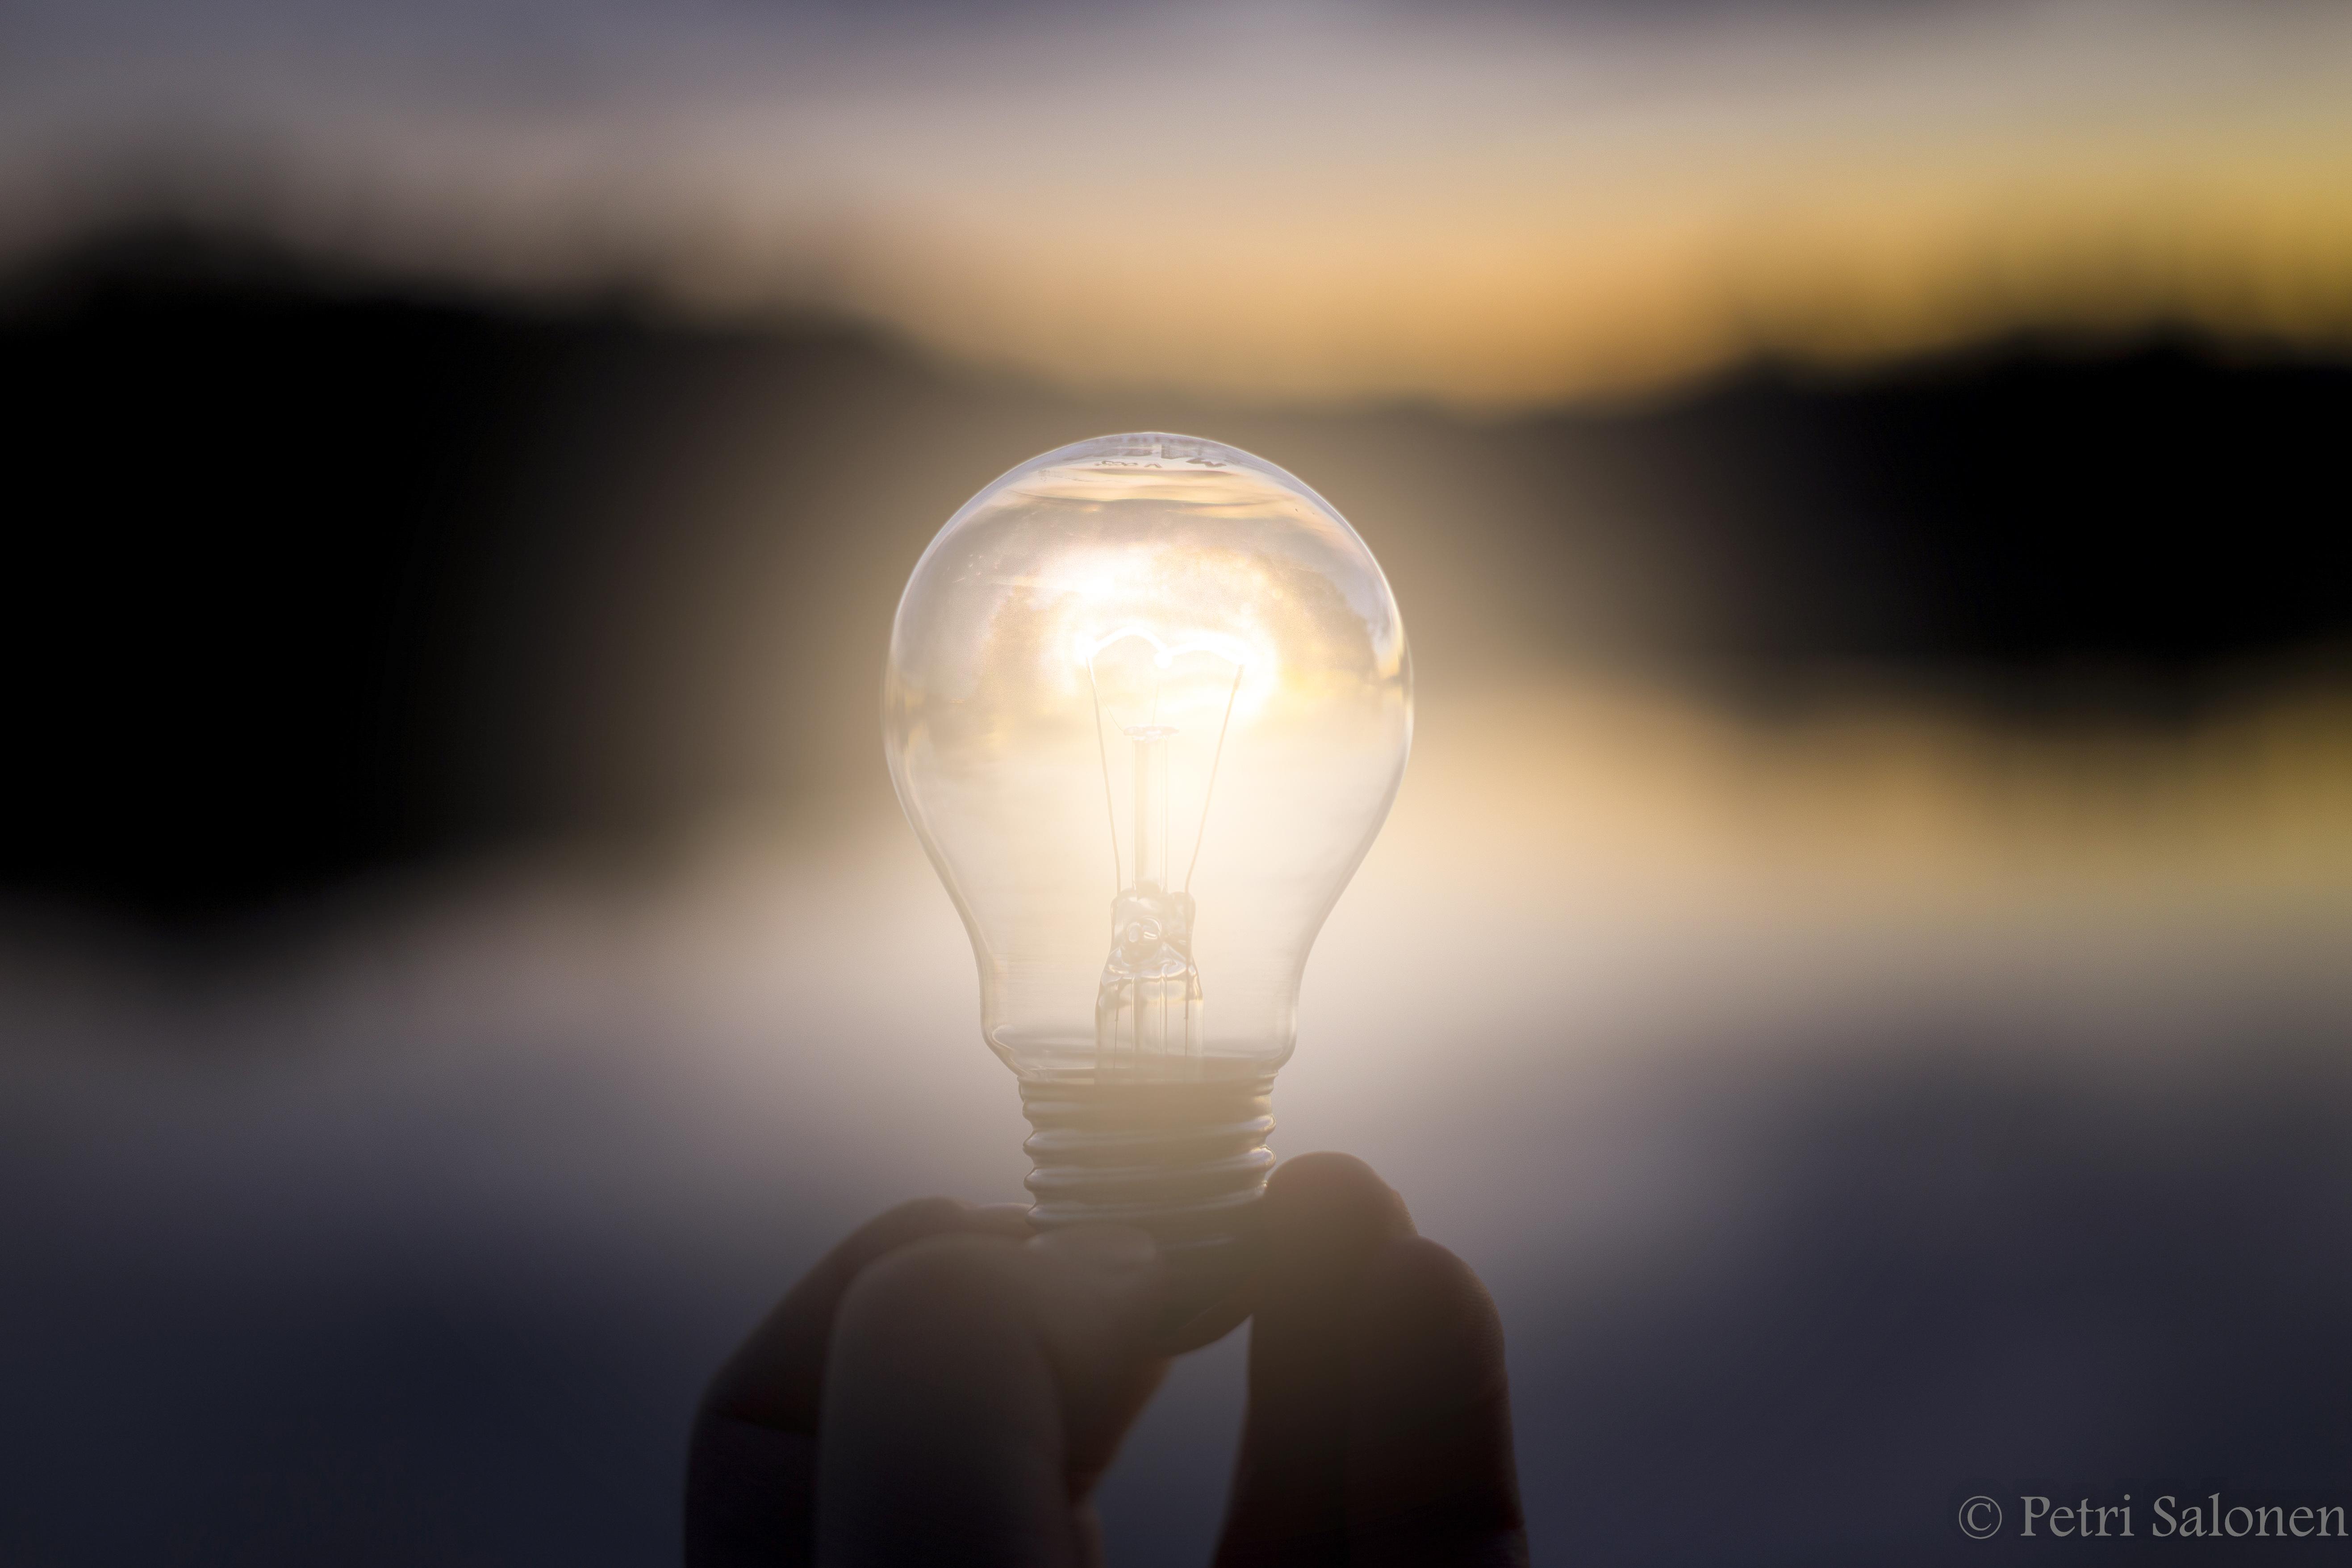 Wallpaper : sunlight, landscape, Photoshop, reflection, sky ... for Idea Light Bulb Wallpaper  15lptgx